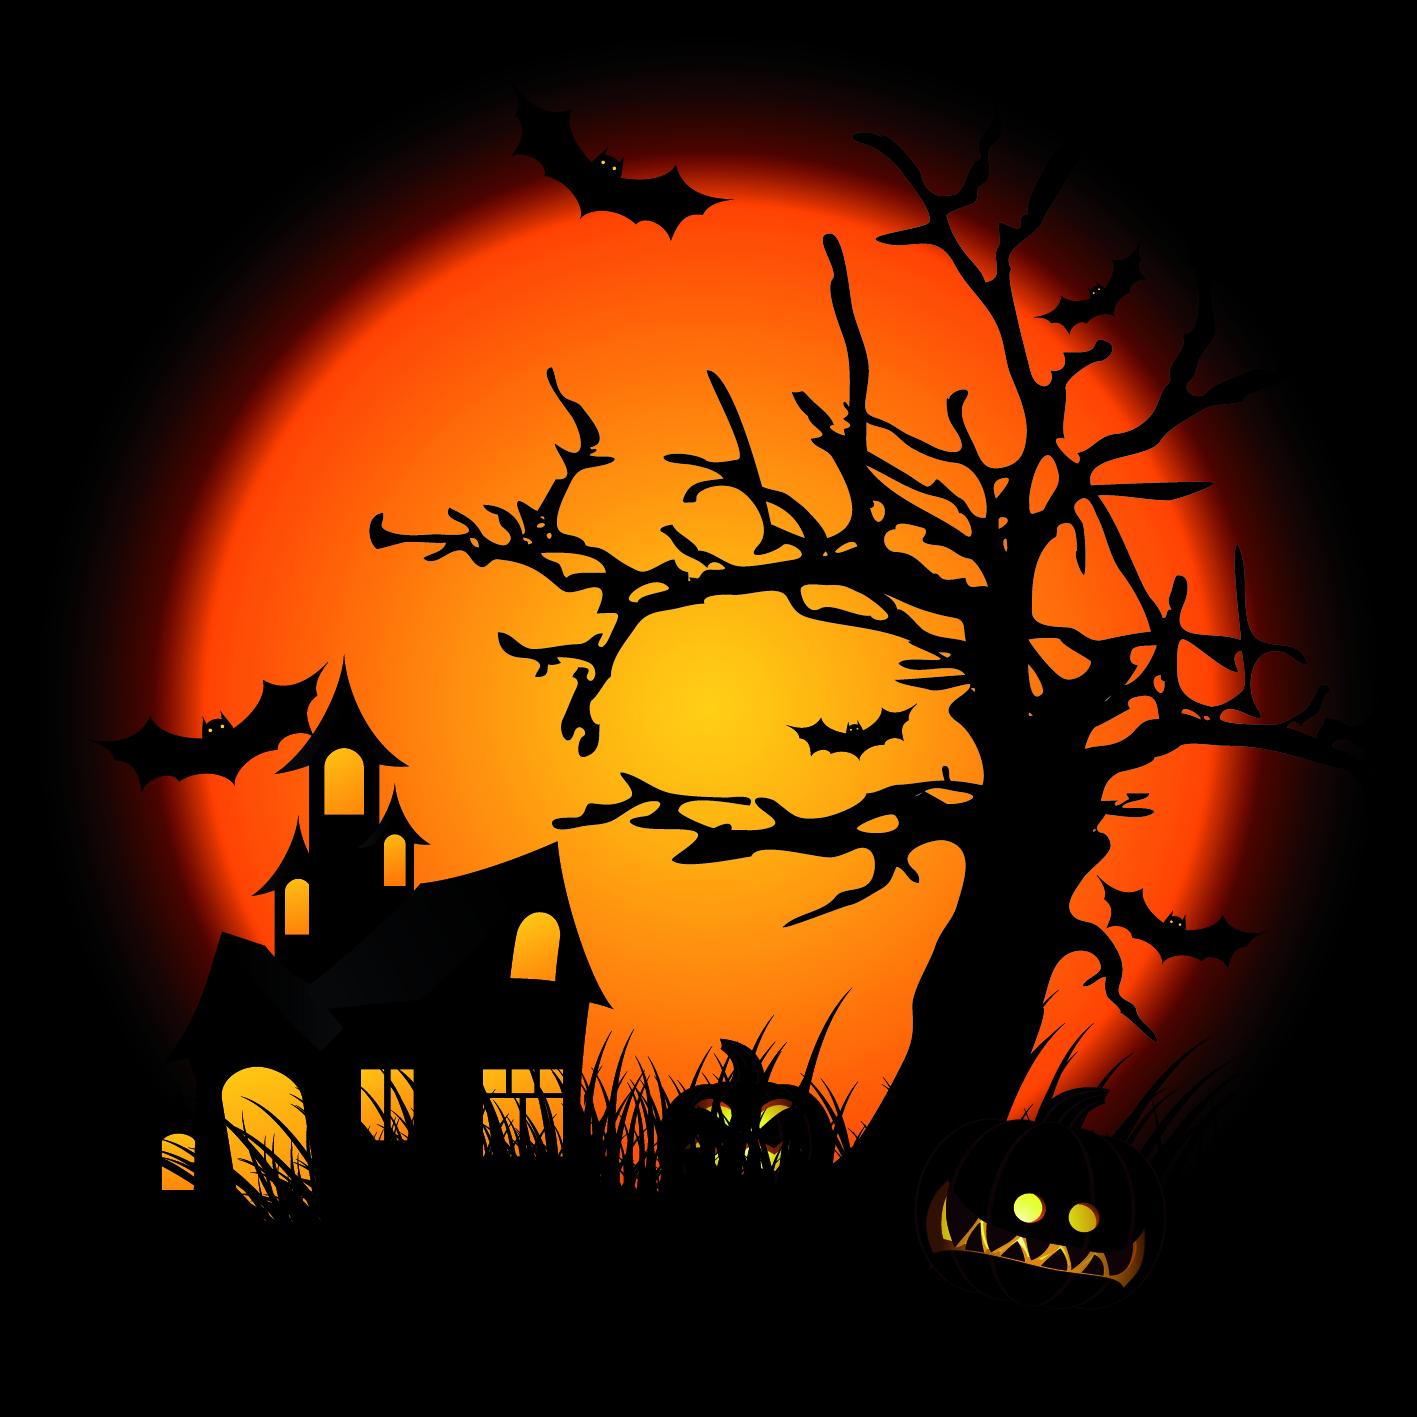 Free Halloween Happy Halloween Clipart F-Free halloween happy halloween clipart free large images clipartwiz-11